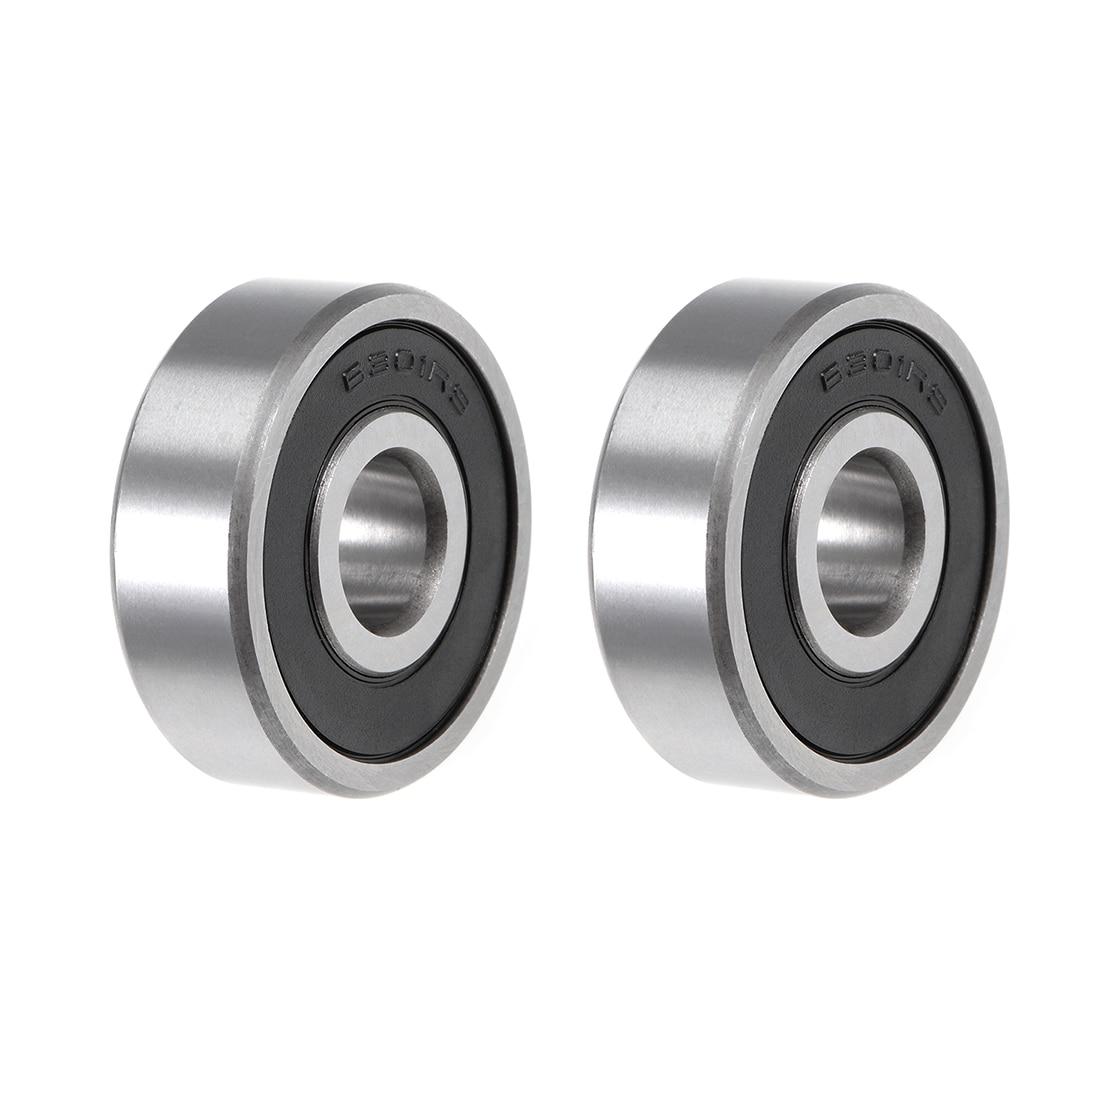 Uxcell ABEC-3 Bearings, 6200-6300 Ball Bearing 6301-2RS 2pcs